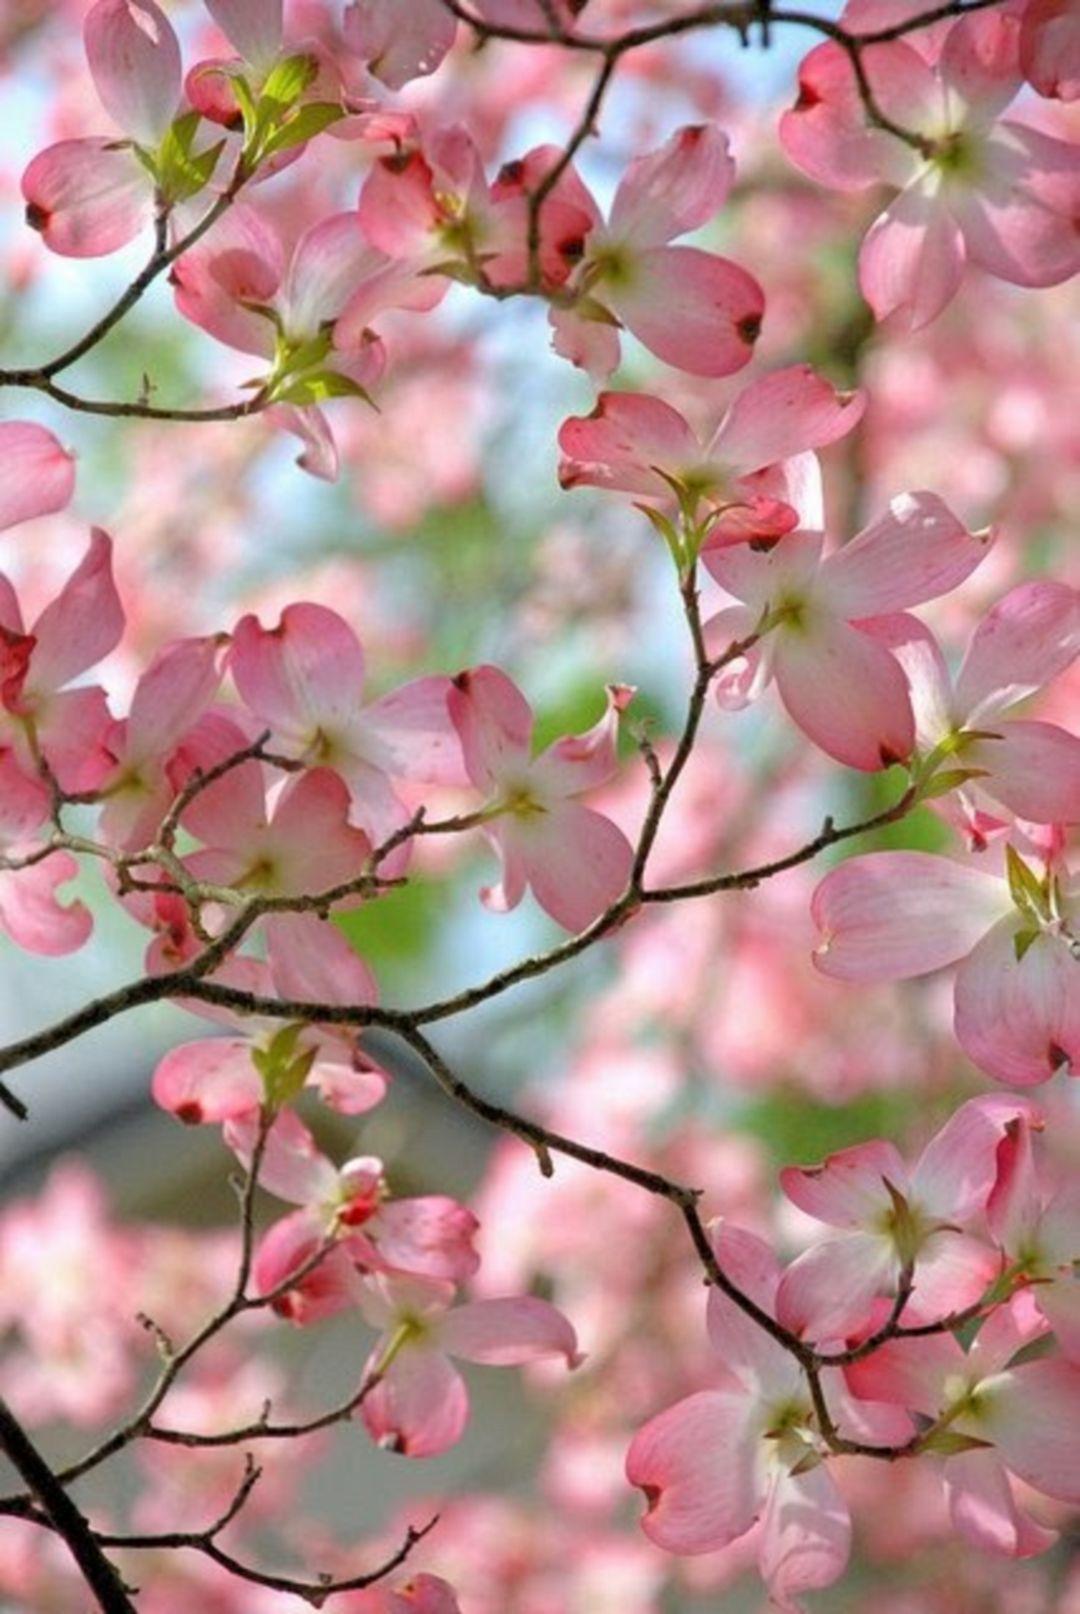 Phenomenon 65 Beautiful Flowering Tree Ideas For Your Home Yard Https Decoor Net 65 Beautiful Flowering Tree Idea Dogwood Blooms Flowering Trees Pink Dogwood